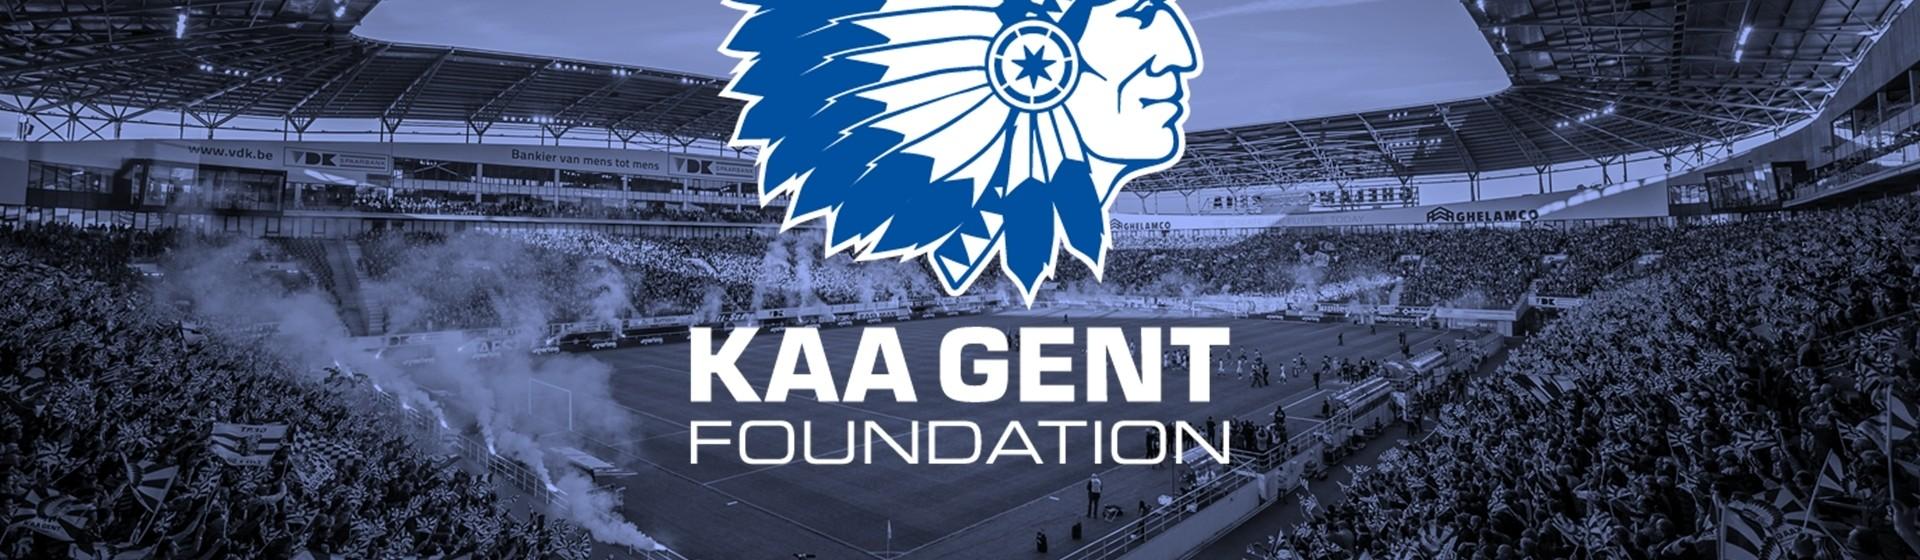 Voetbal In De Stad Become Kaa Gent Foundation European